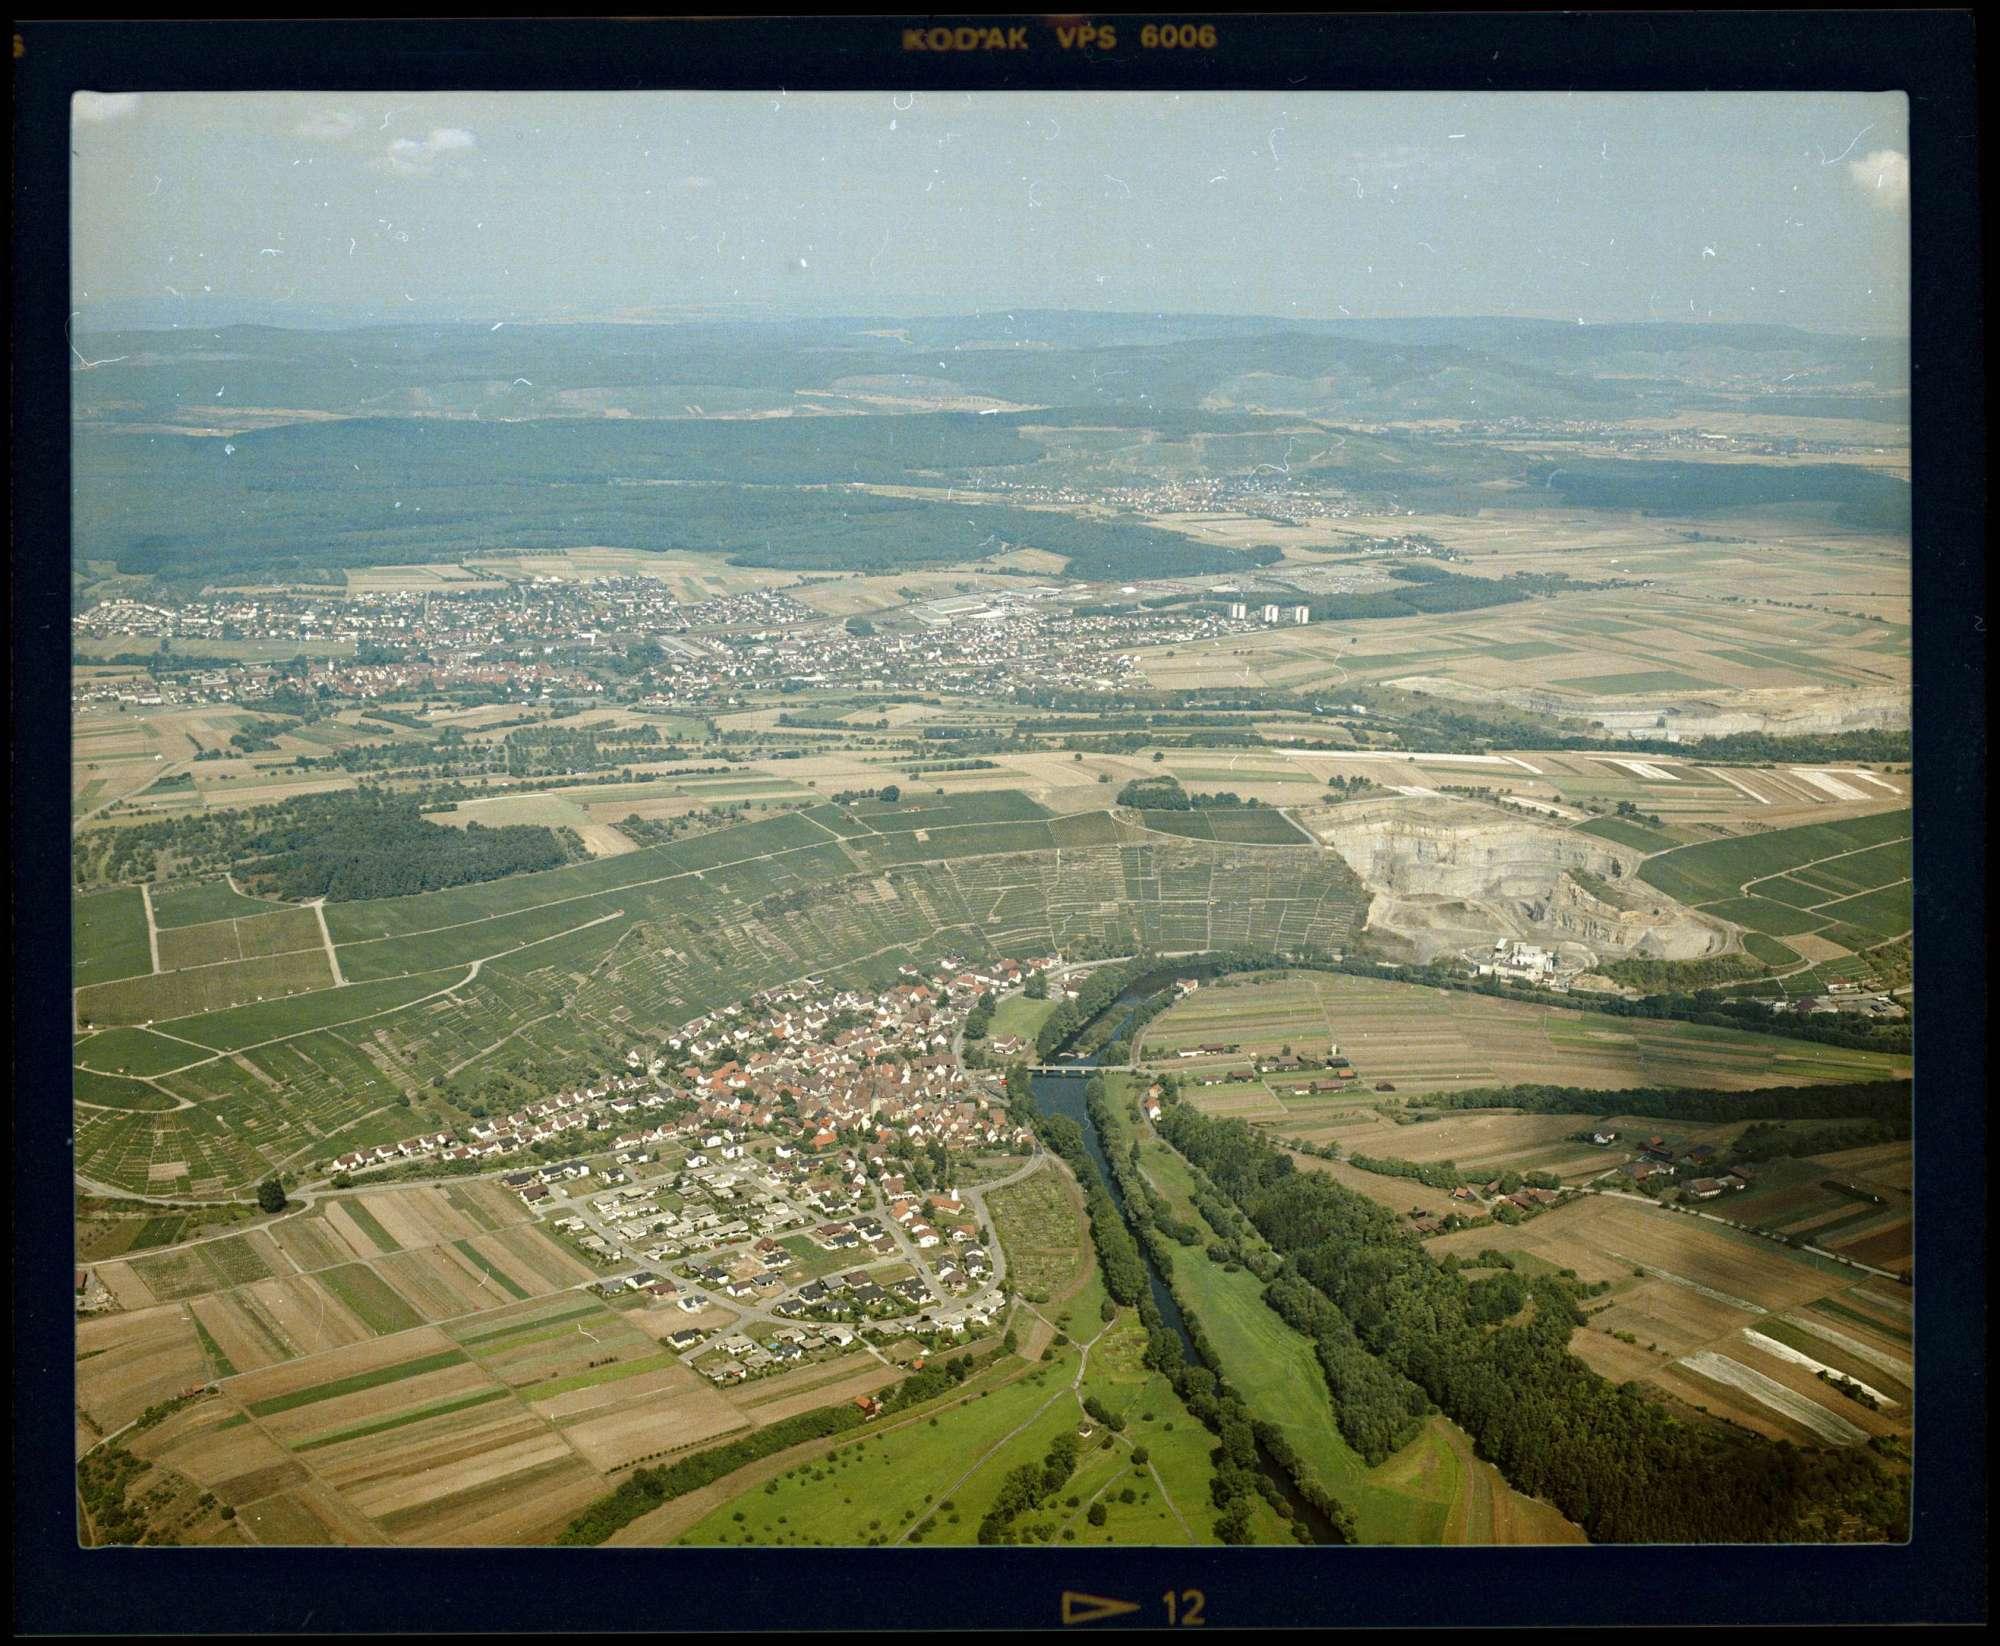 Roßwag, Luftbild, Bild 1